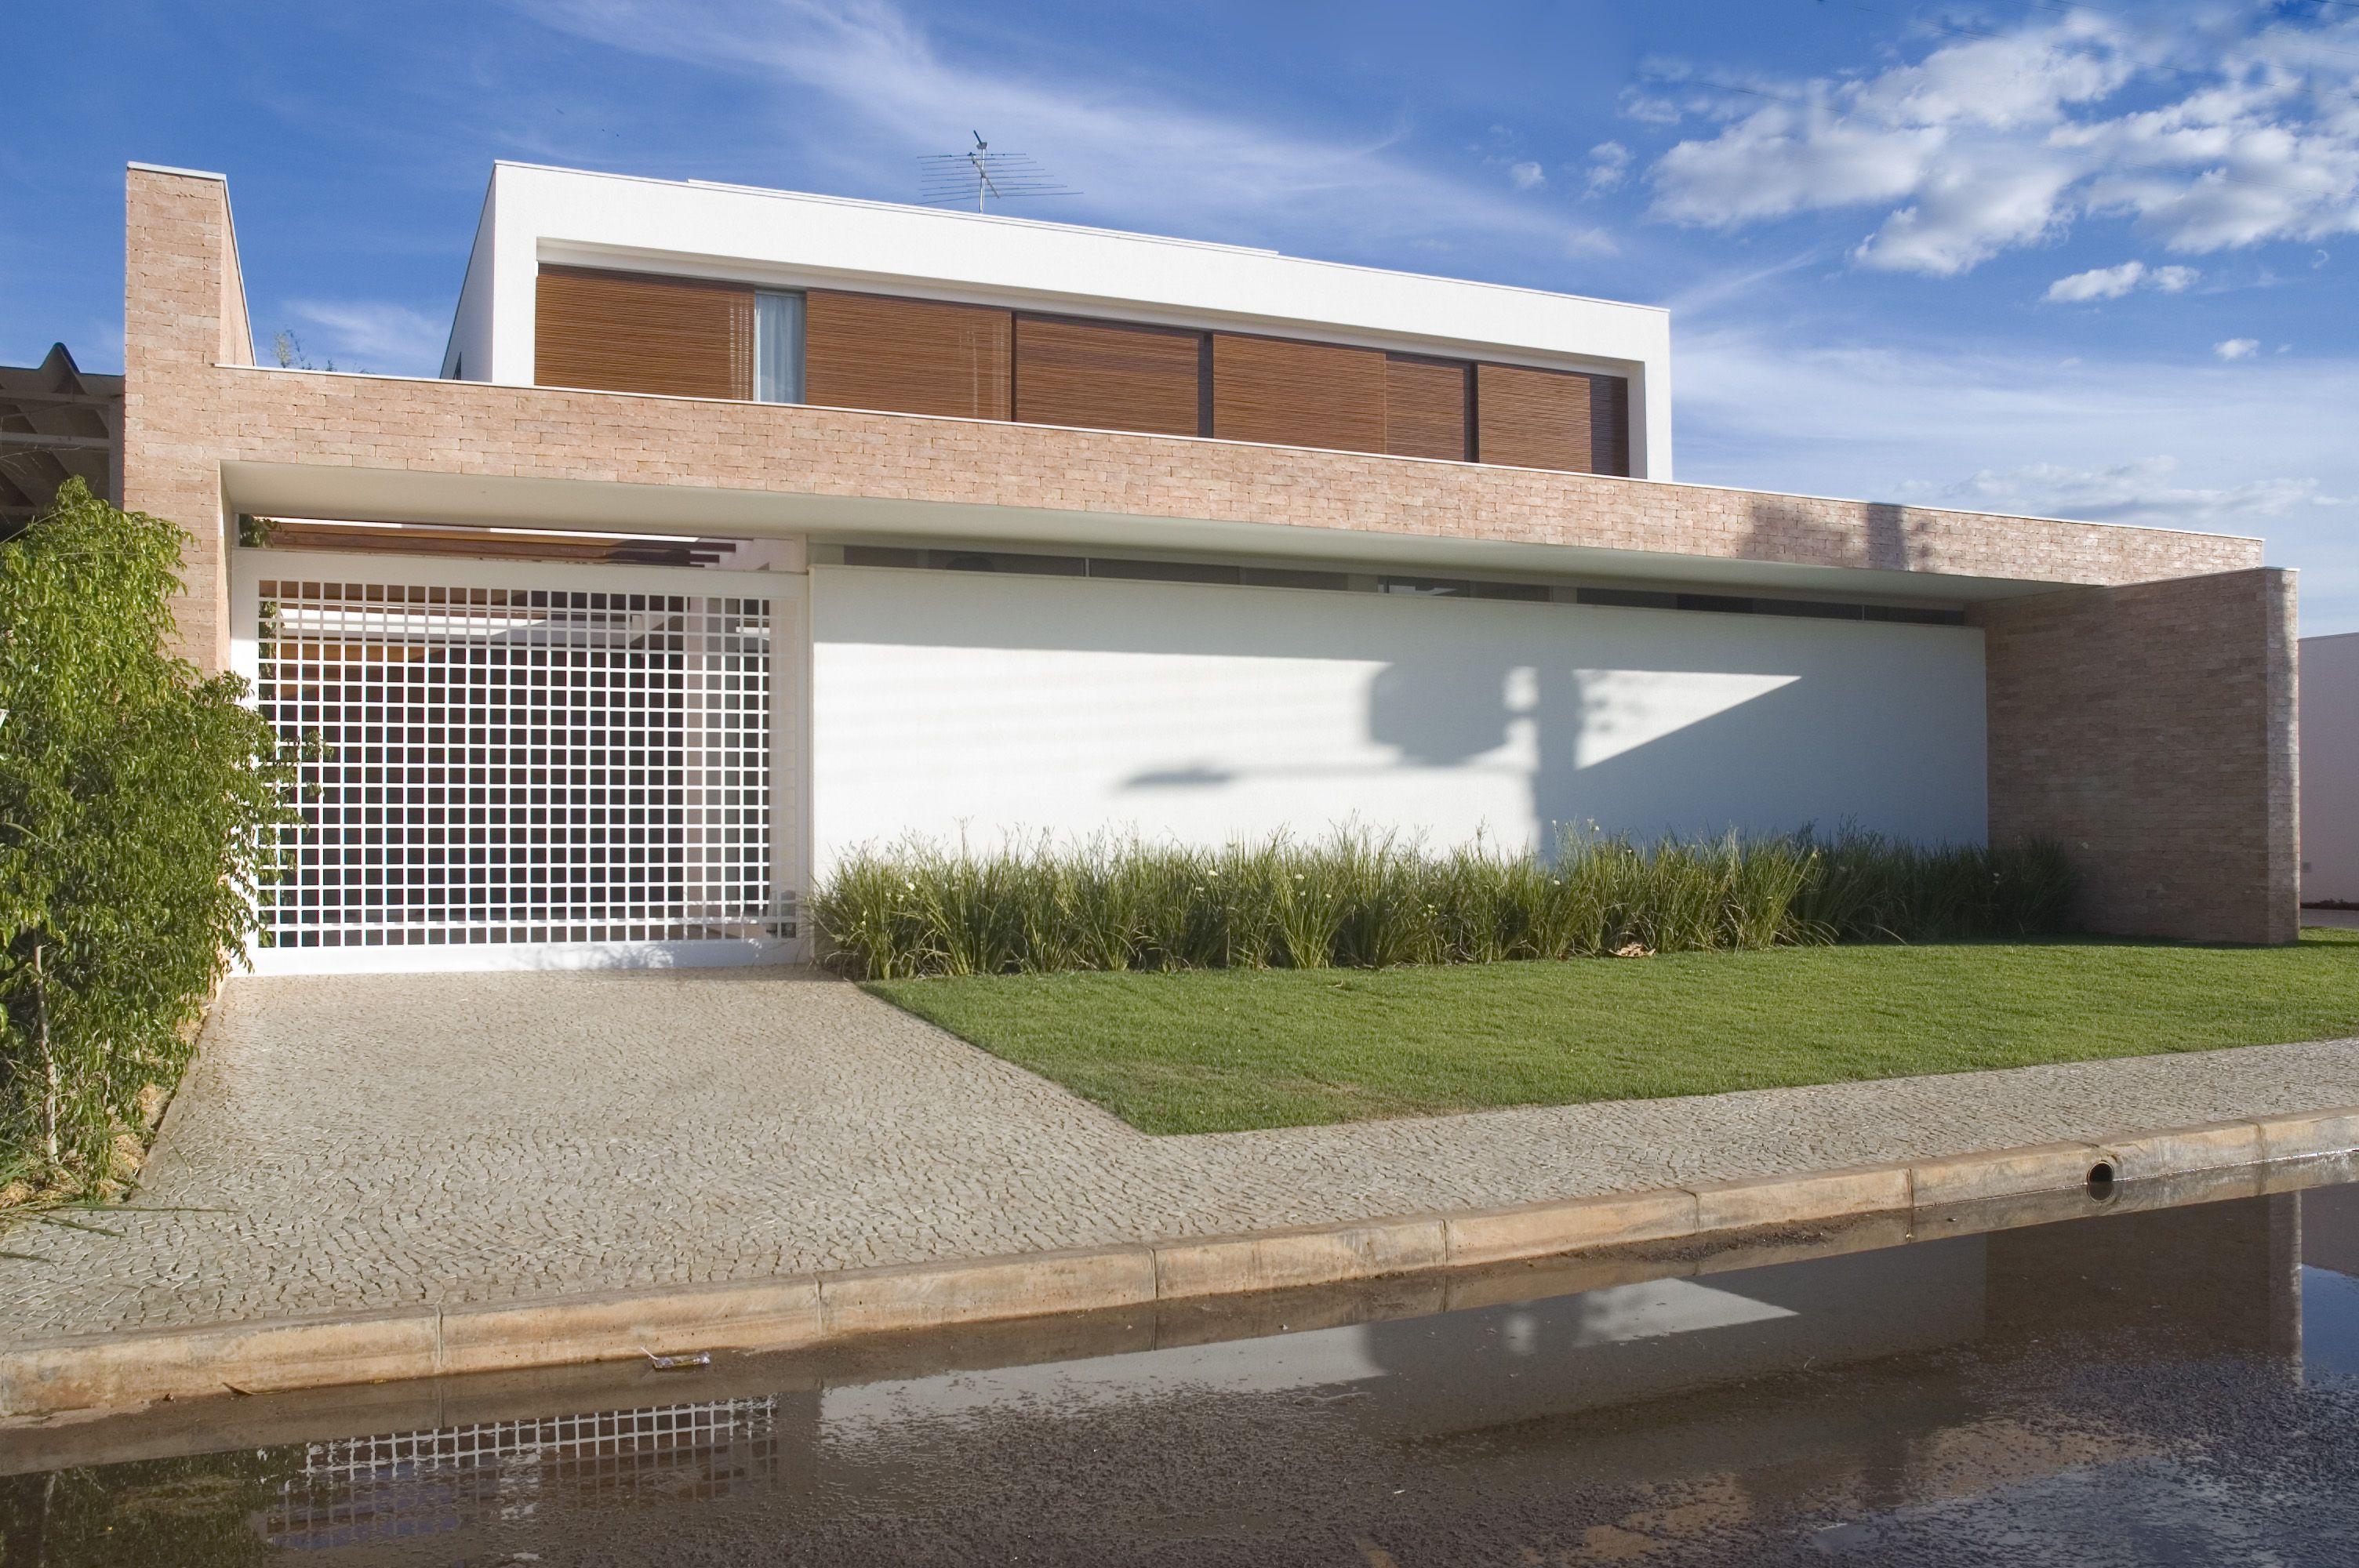 Casas modernas arquitectura pinterest - Arquitectura moderna casas ...